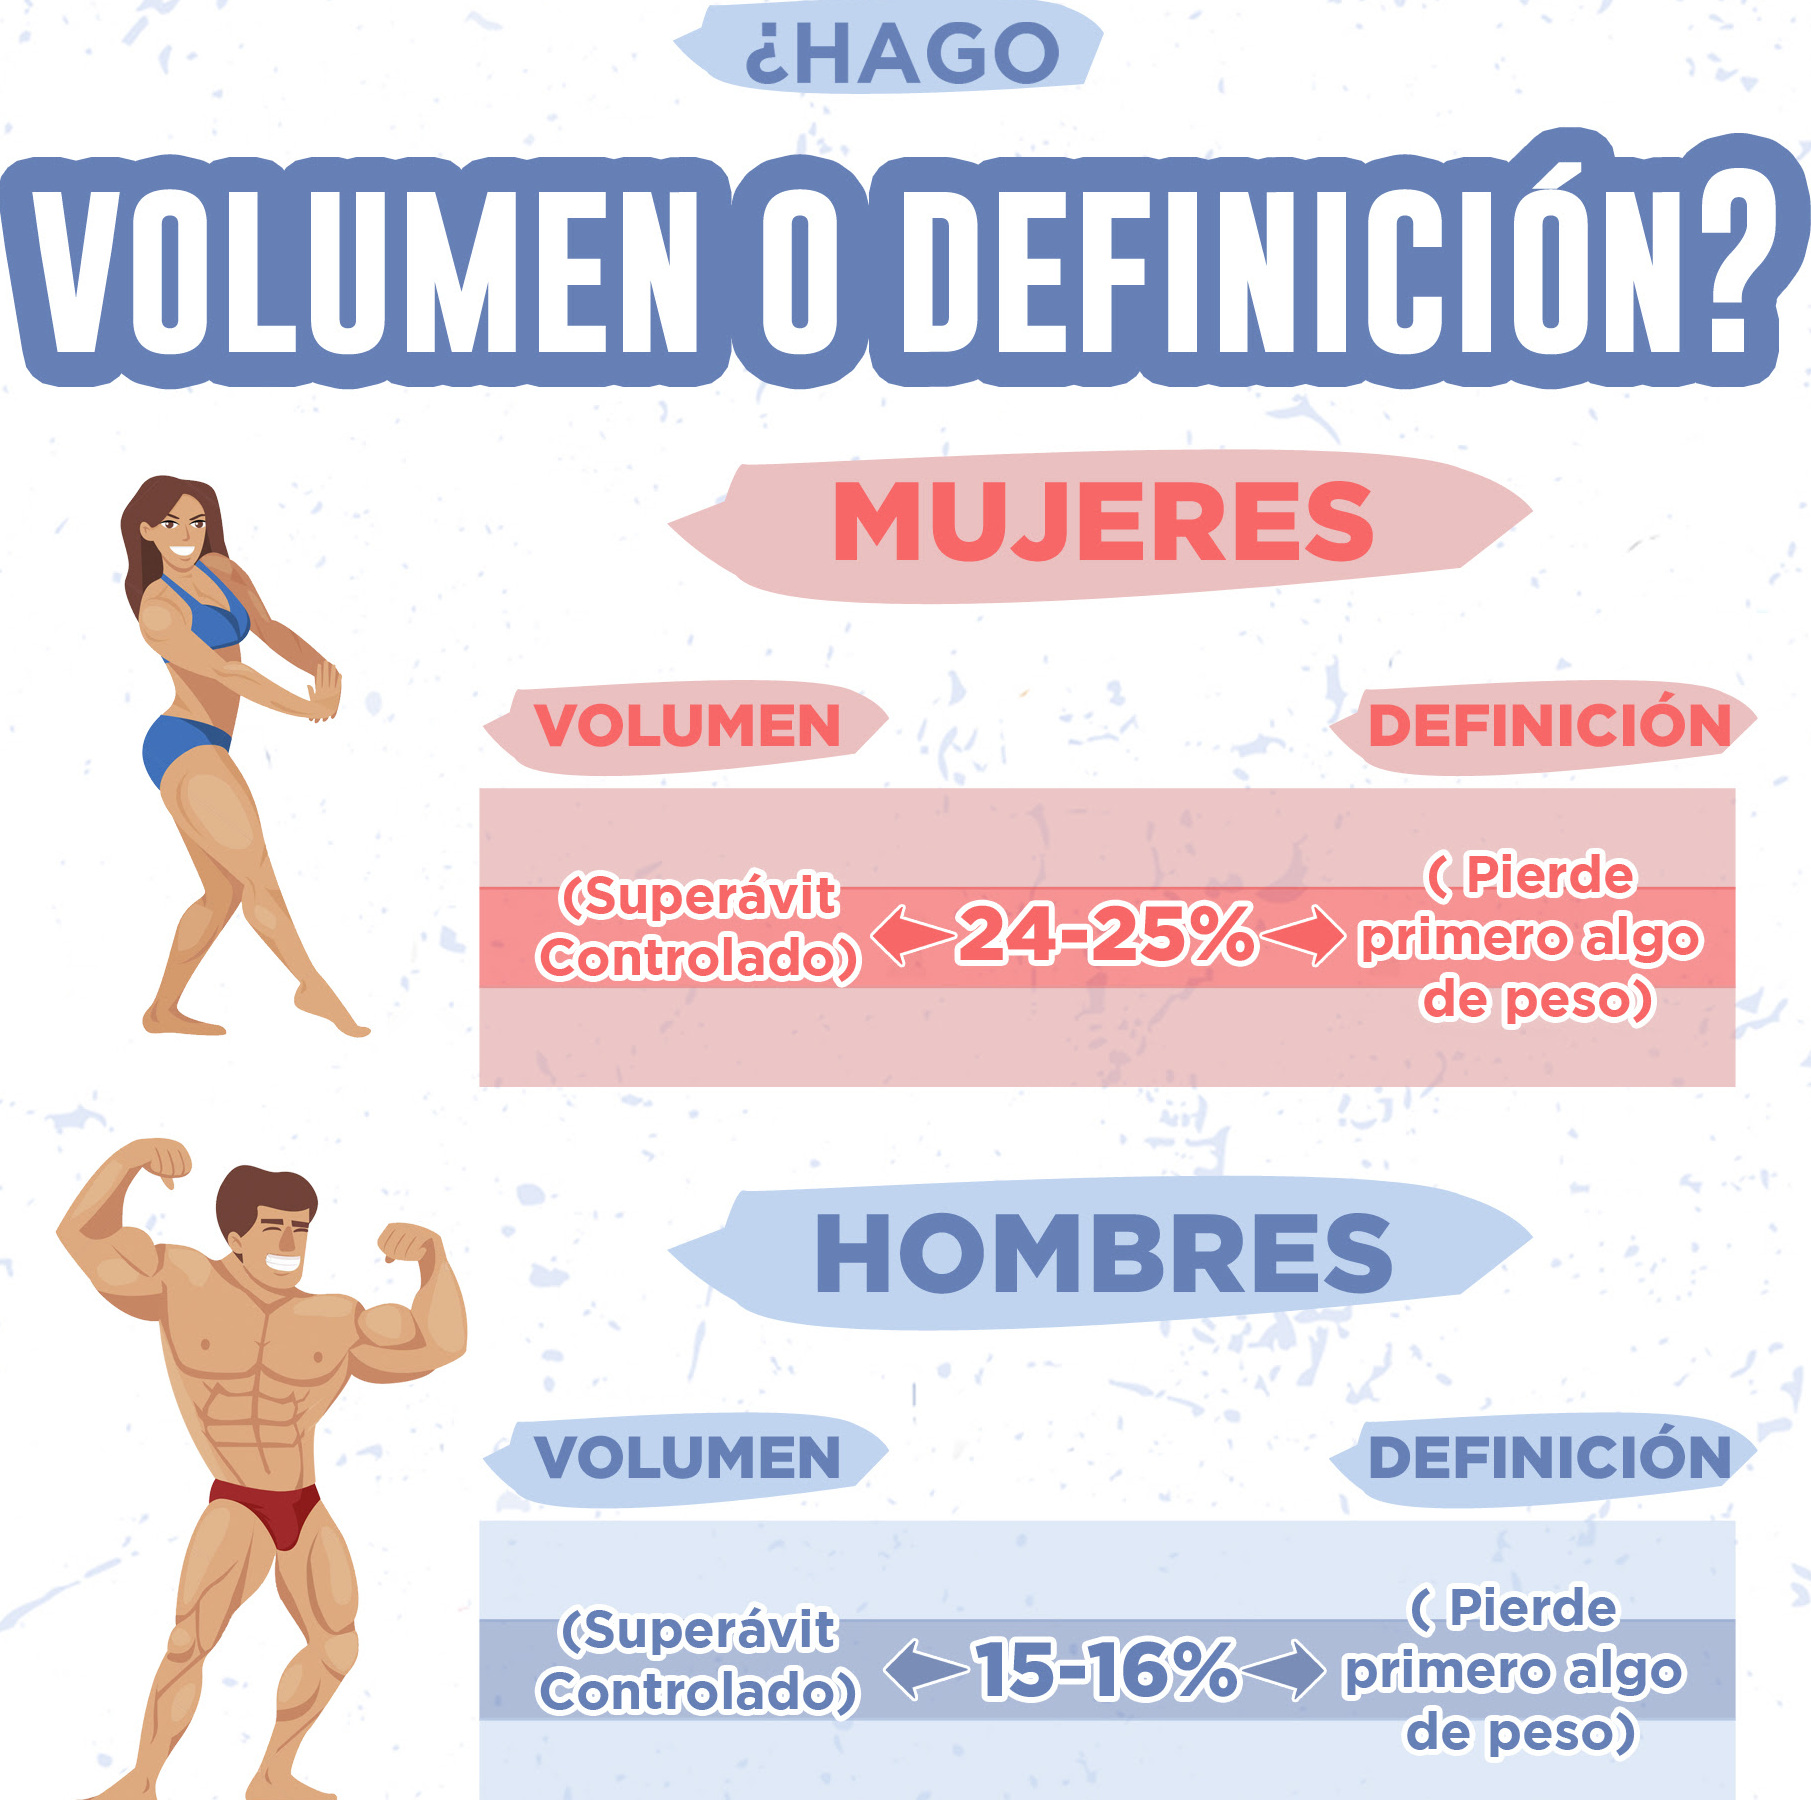 Dietas fitness mujer definicion